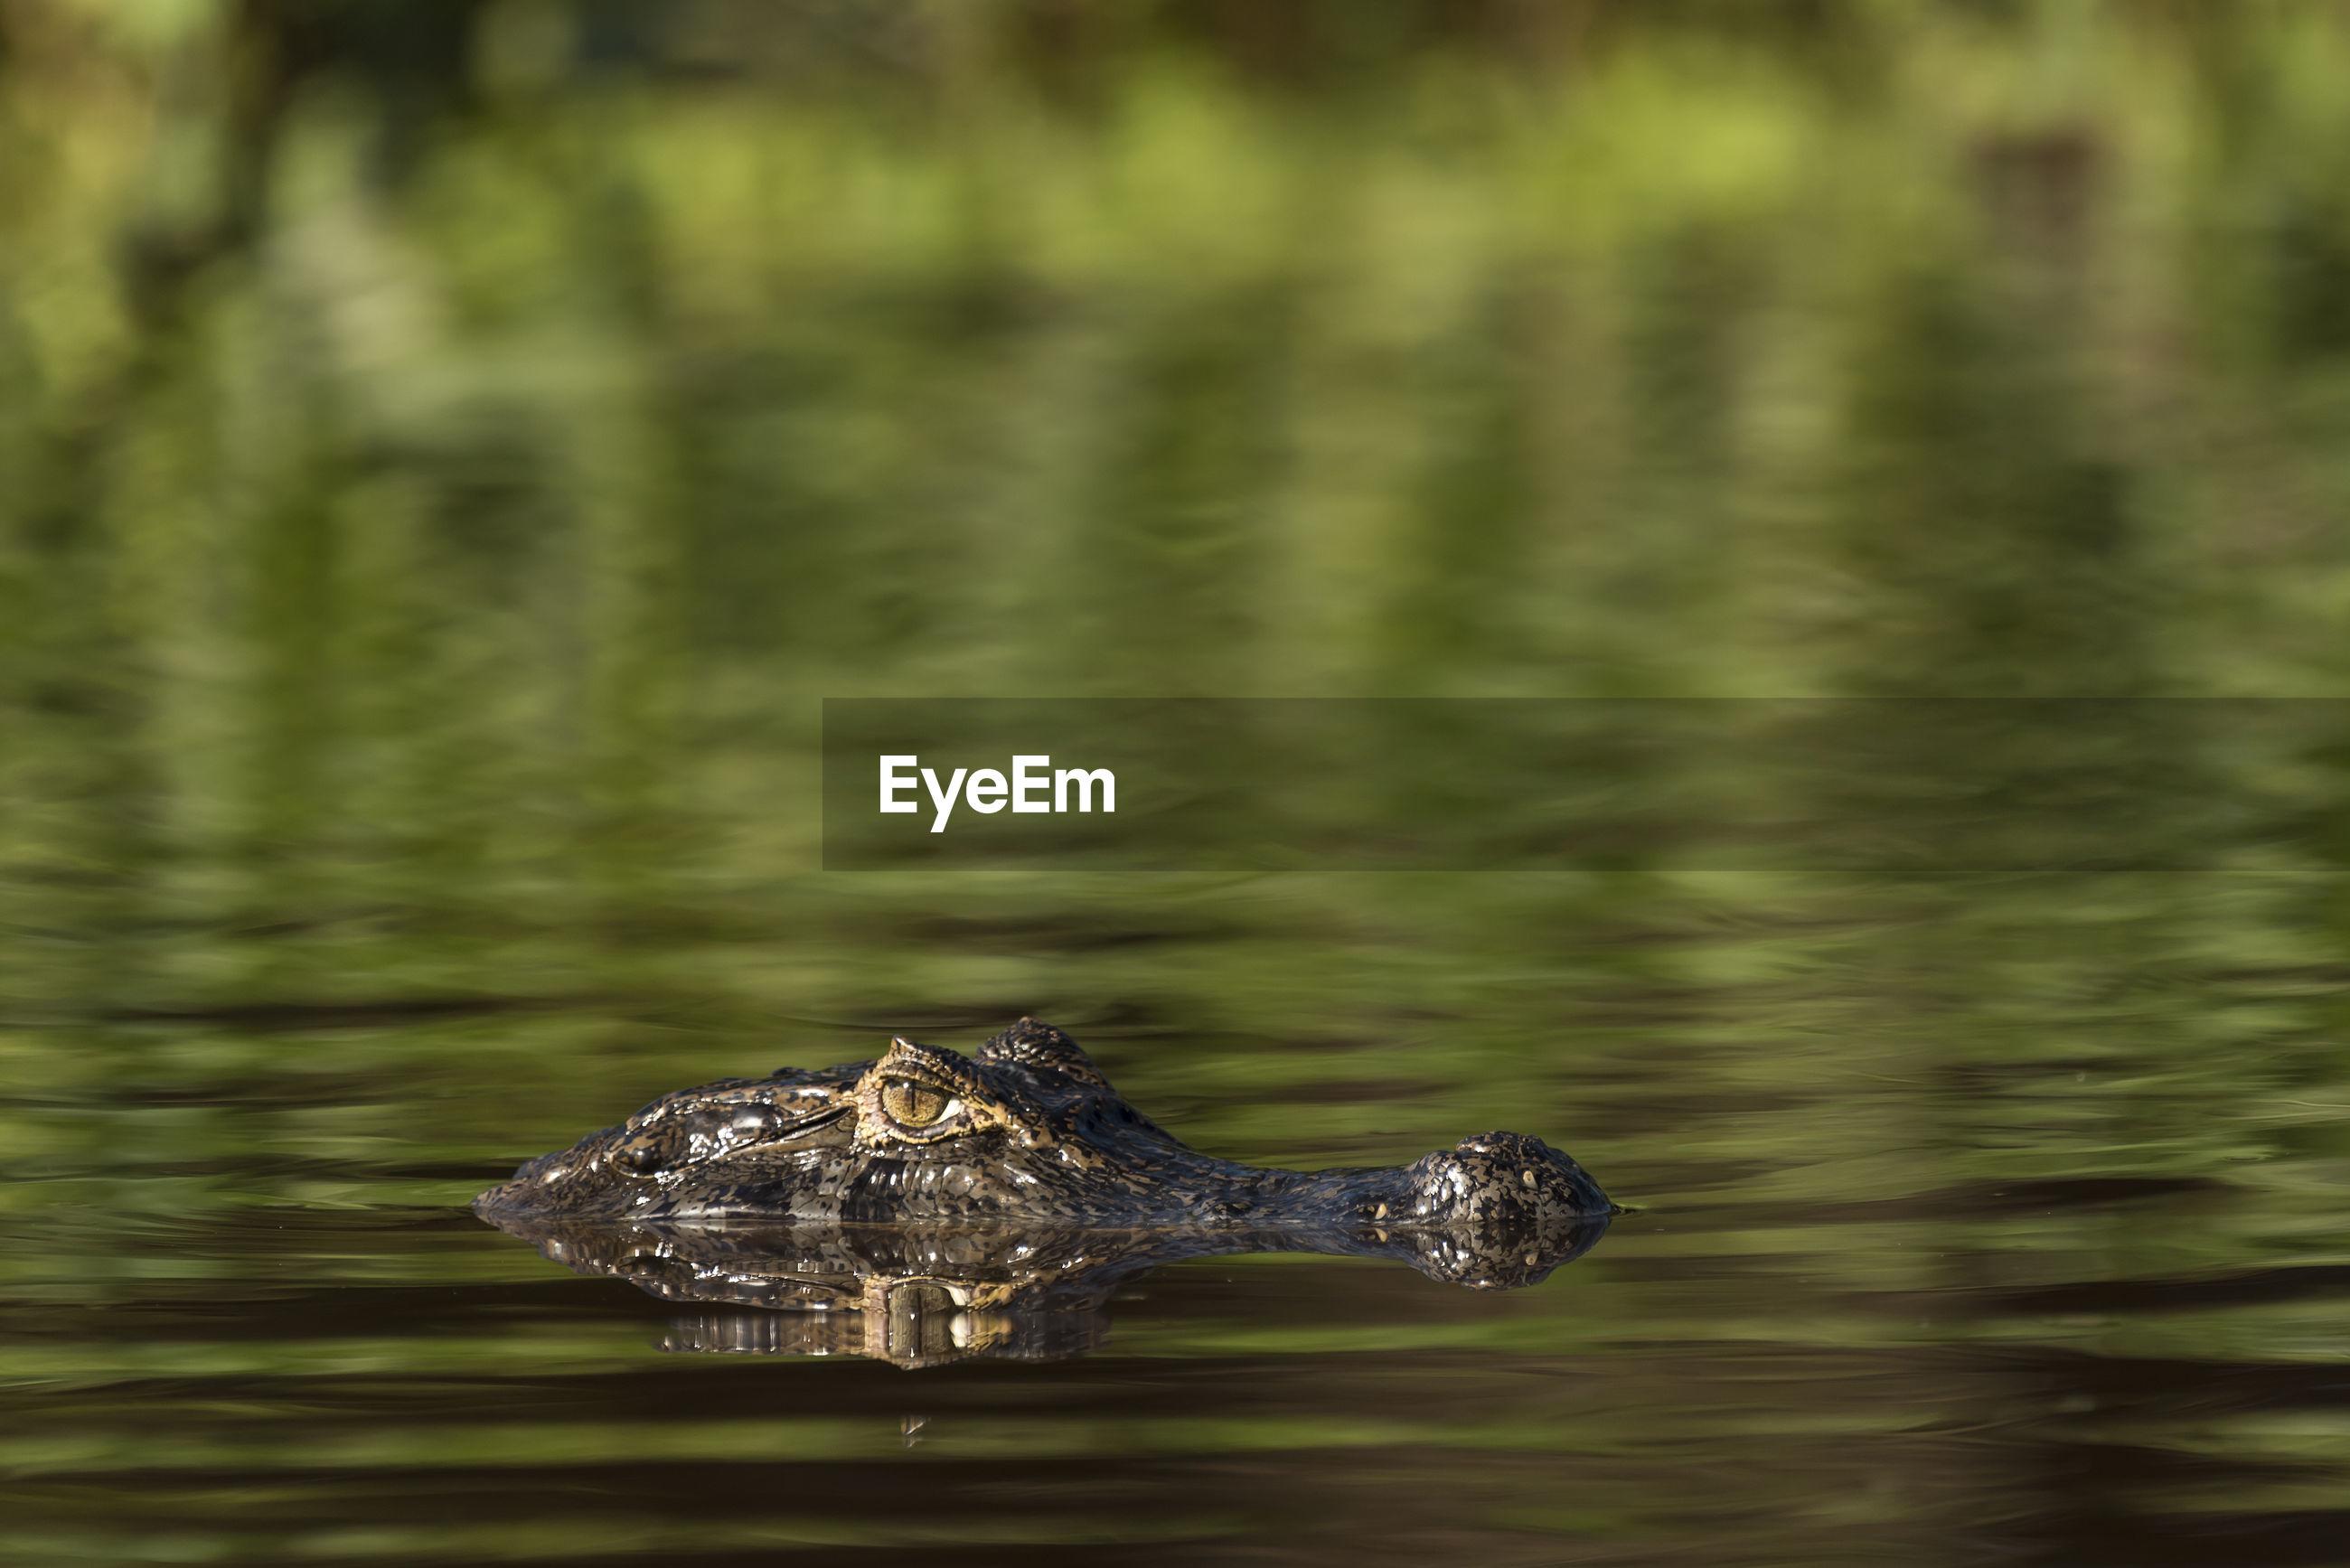 Close-up of alligator swimming in lake